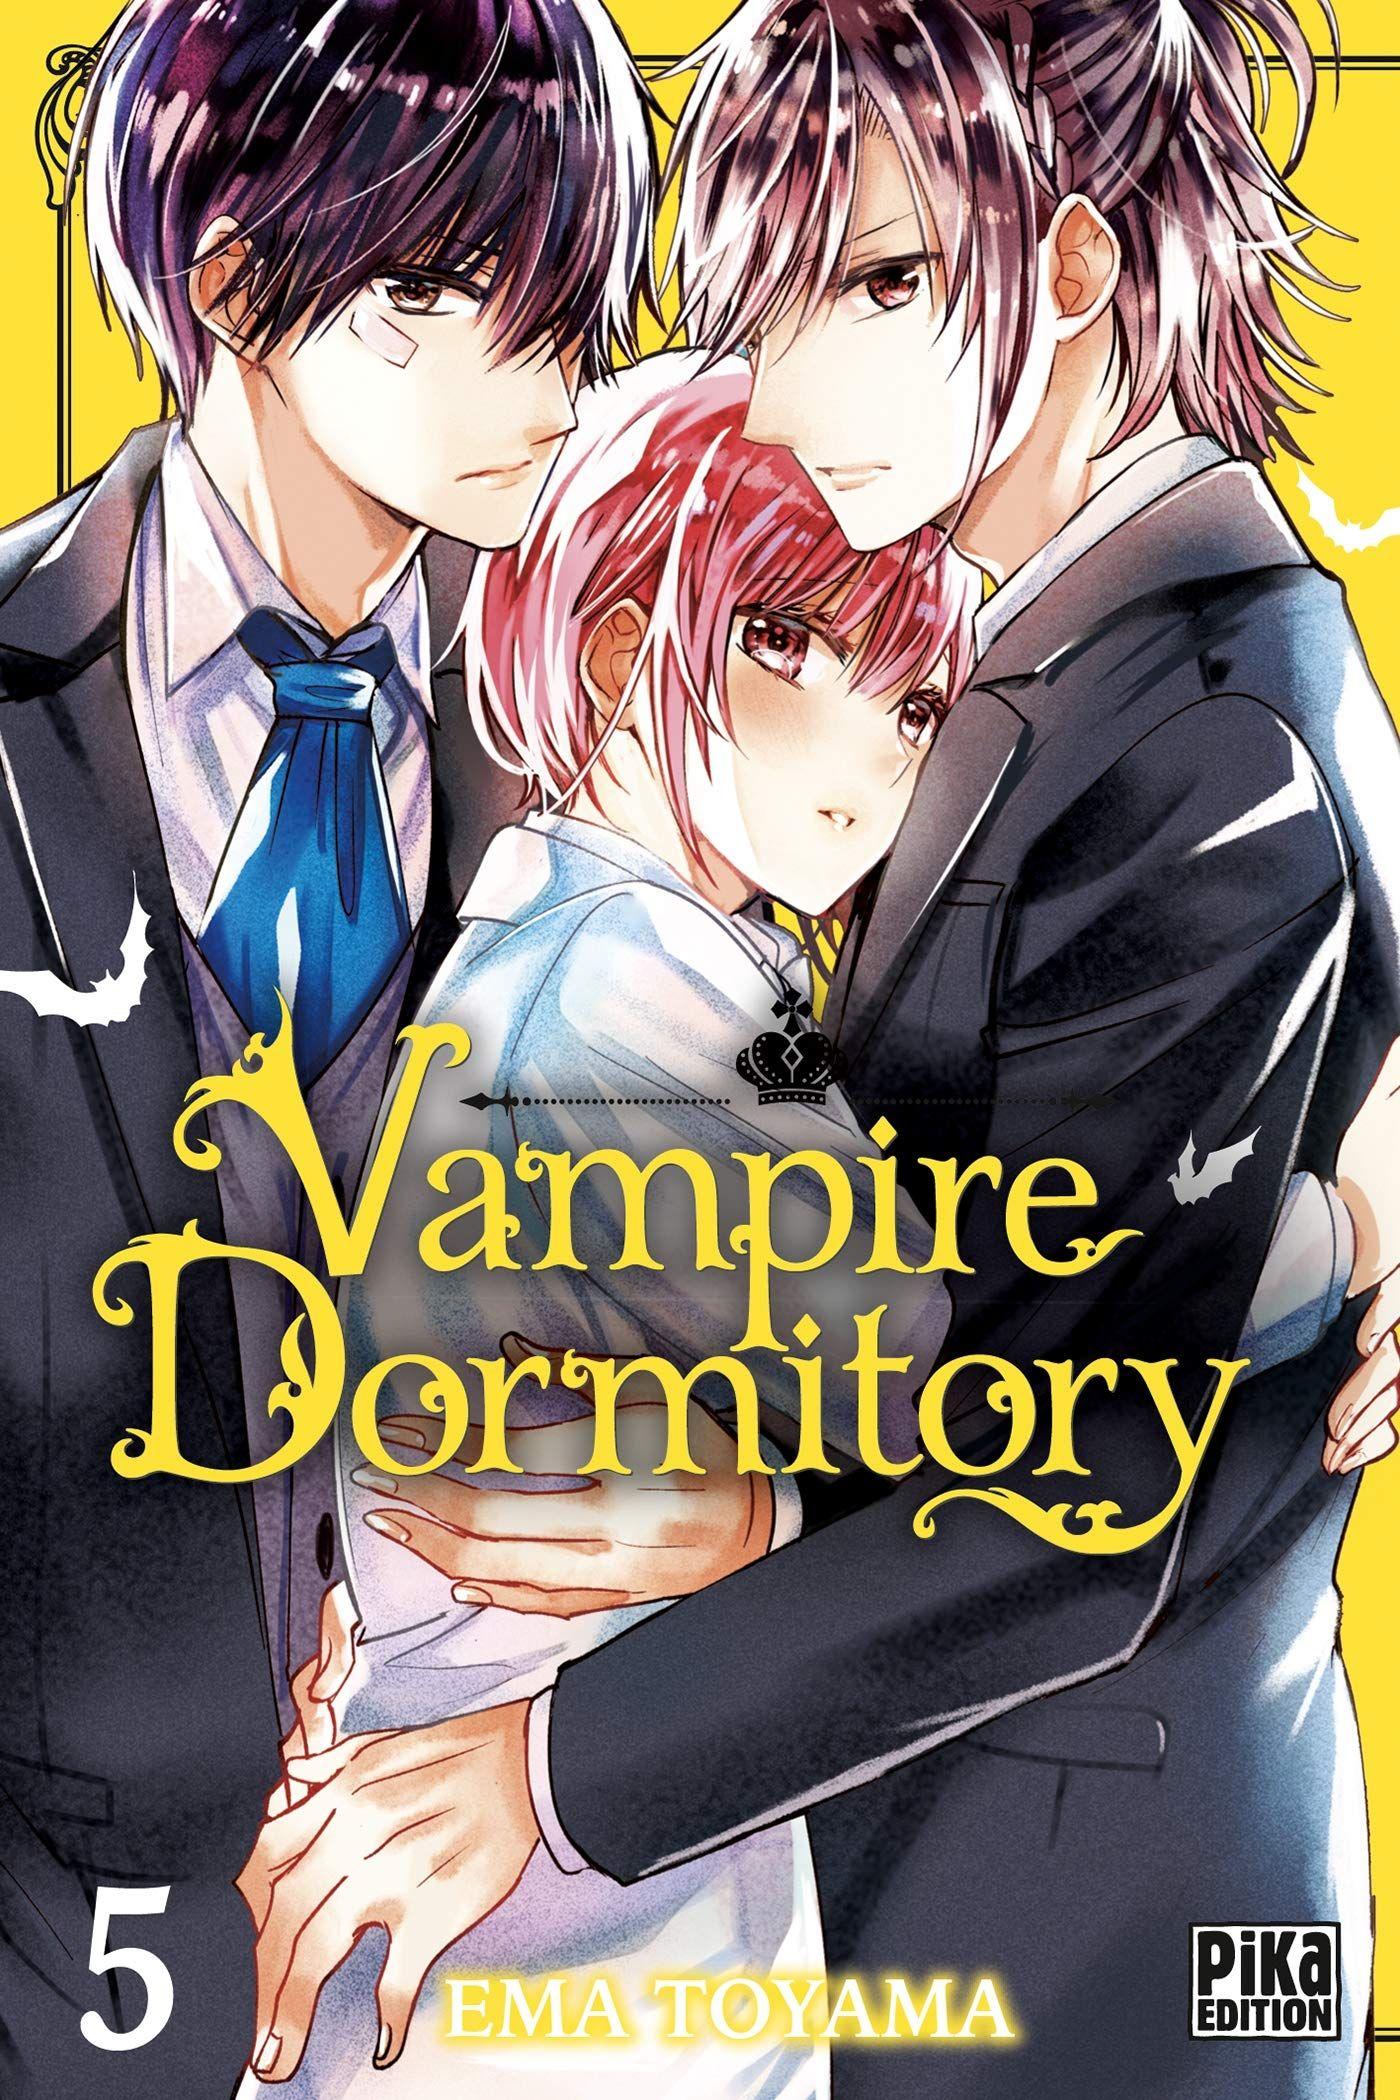 Sortie Manga au Québec JUILLET 2021 Vampire-dormitory-5-pika